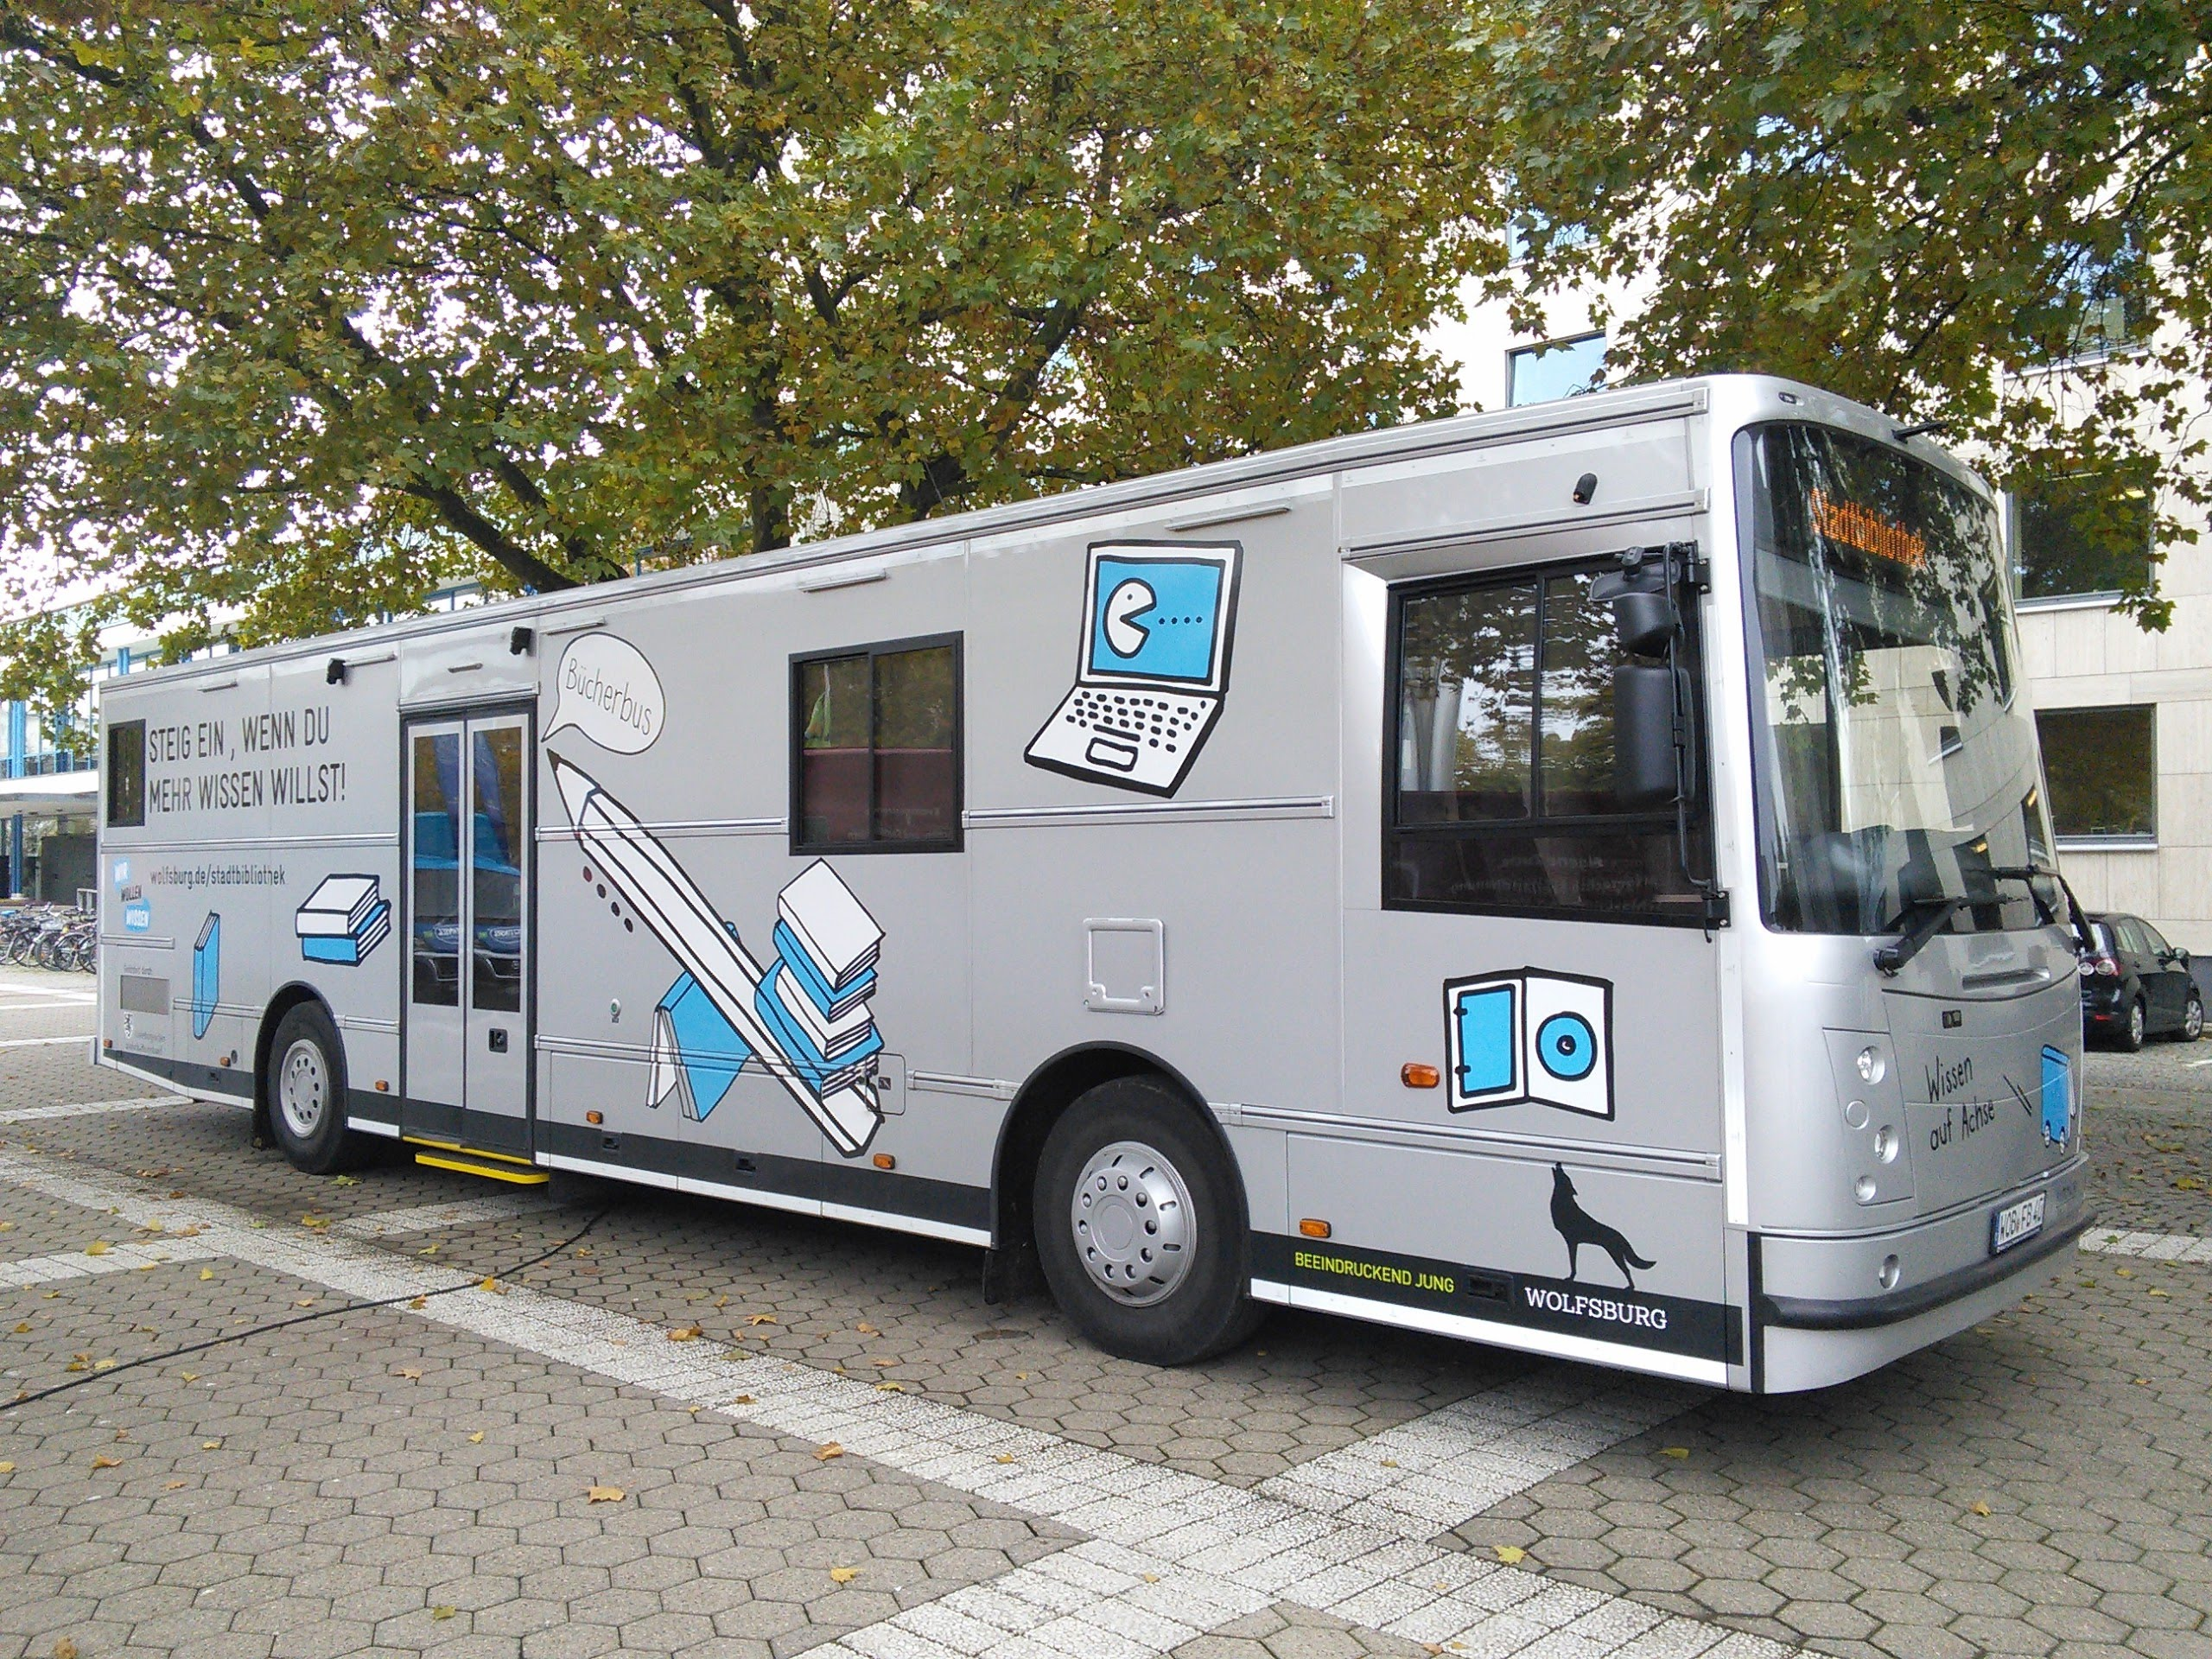 Wolfsburg: Selbstverbuchung ab 2020?